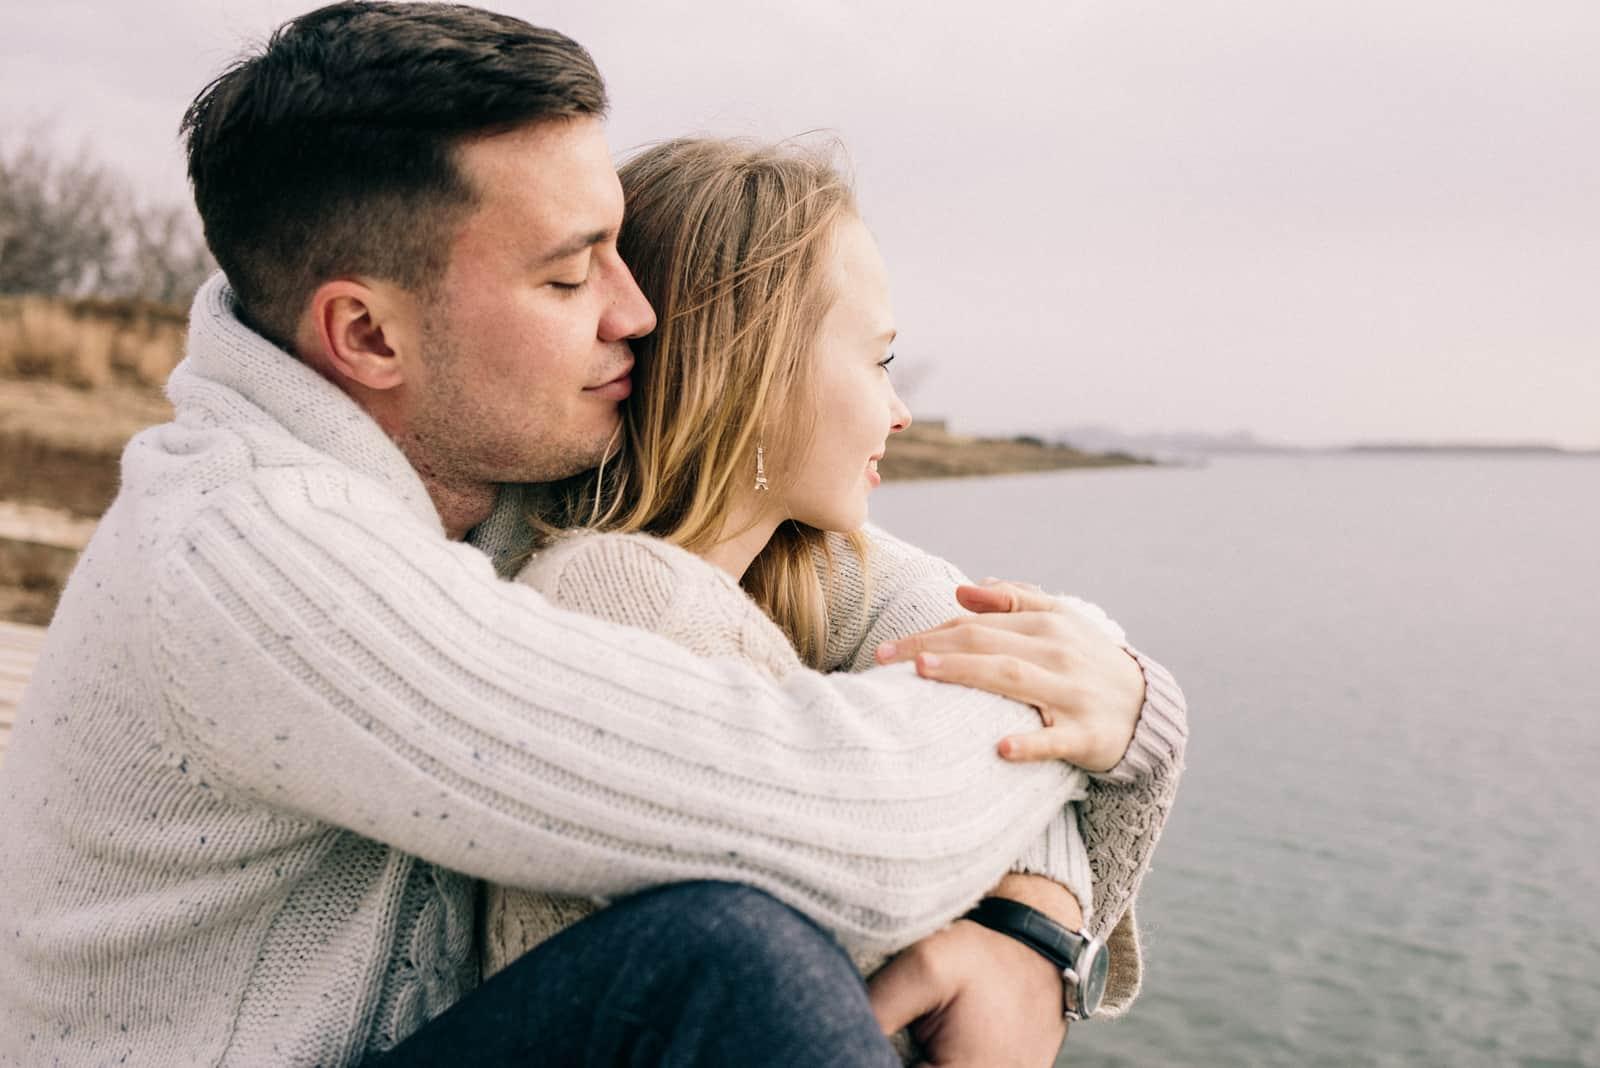 par sitter vid sjön kramar